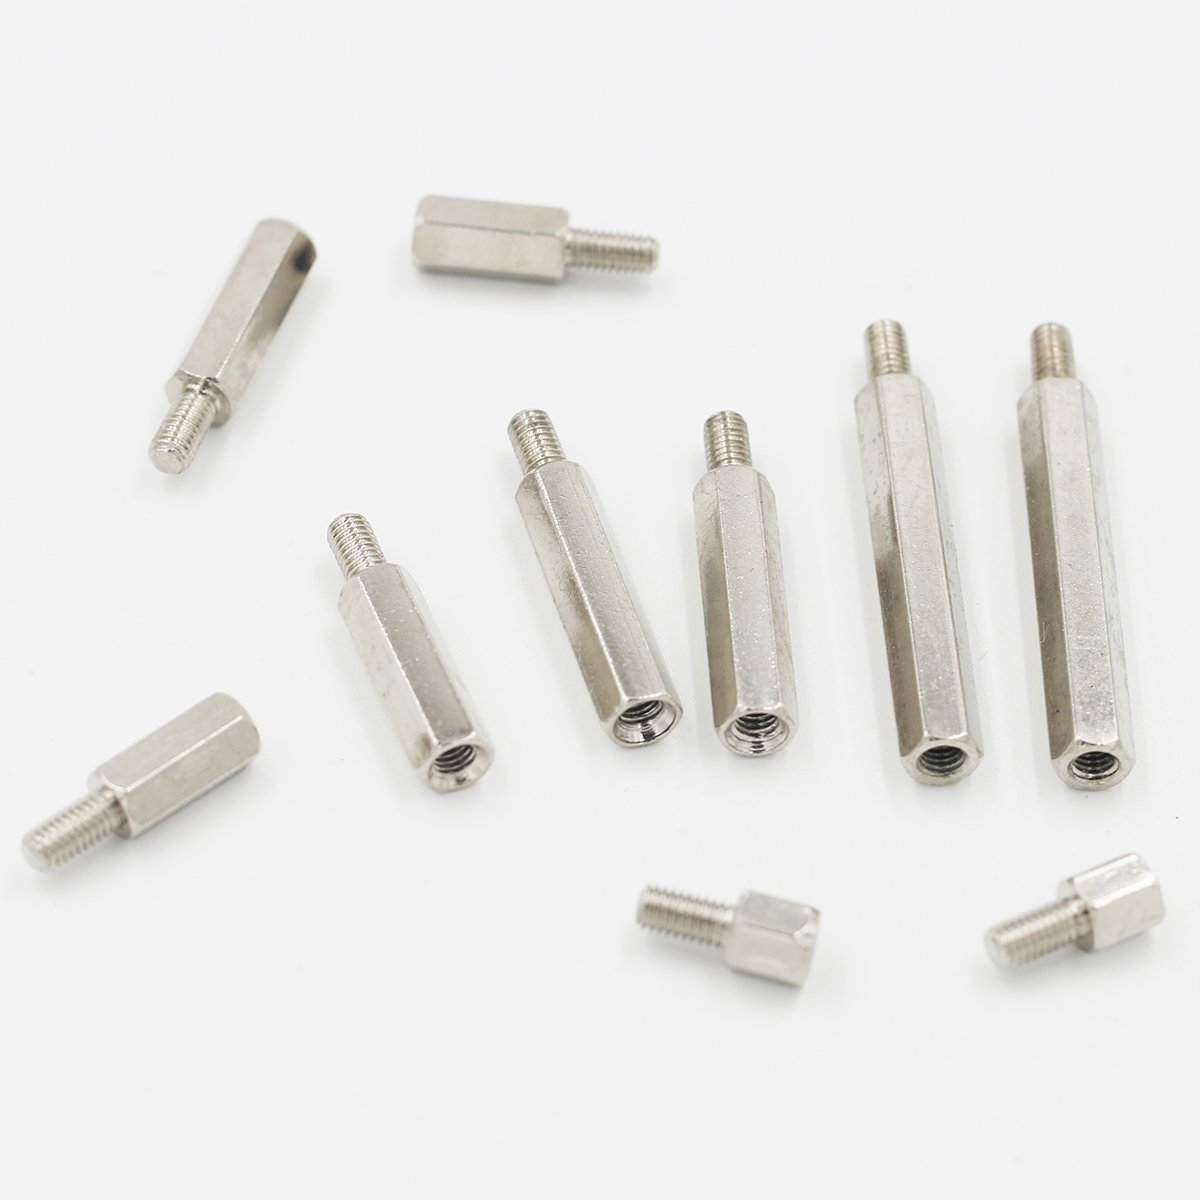 Brass Spacer Standoff Screwnut Assortment Kit 116pc Gold 120pcs M3 Copper Silver Pillars Circuit Board Pcb Nut Home Improvement